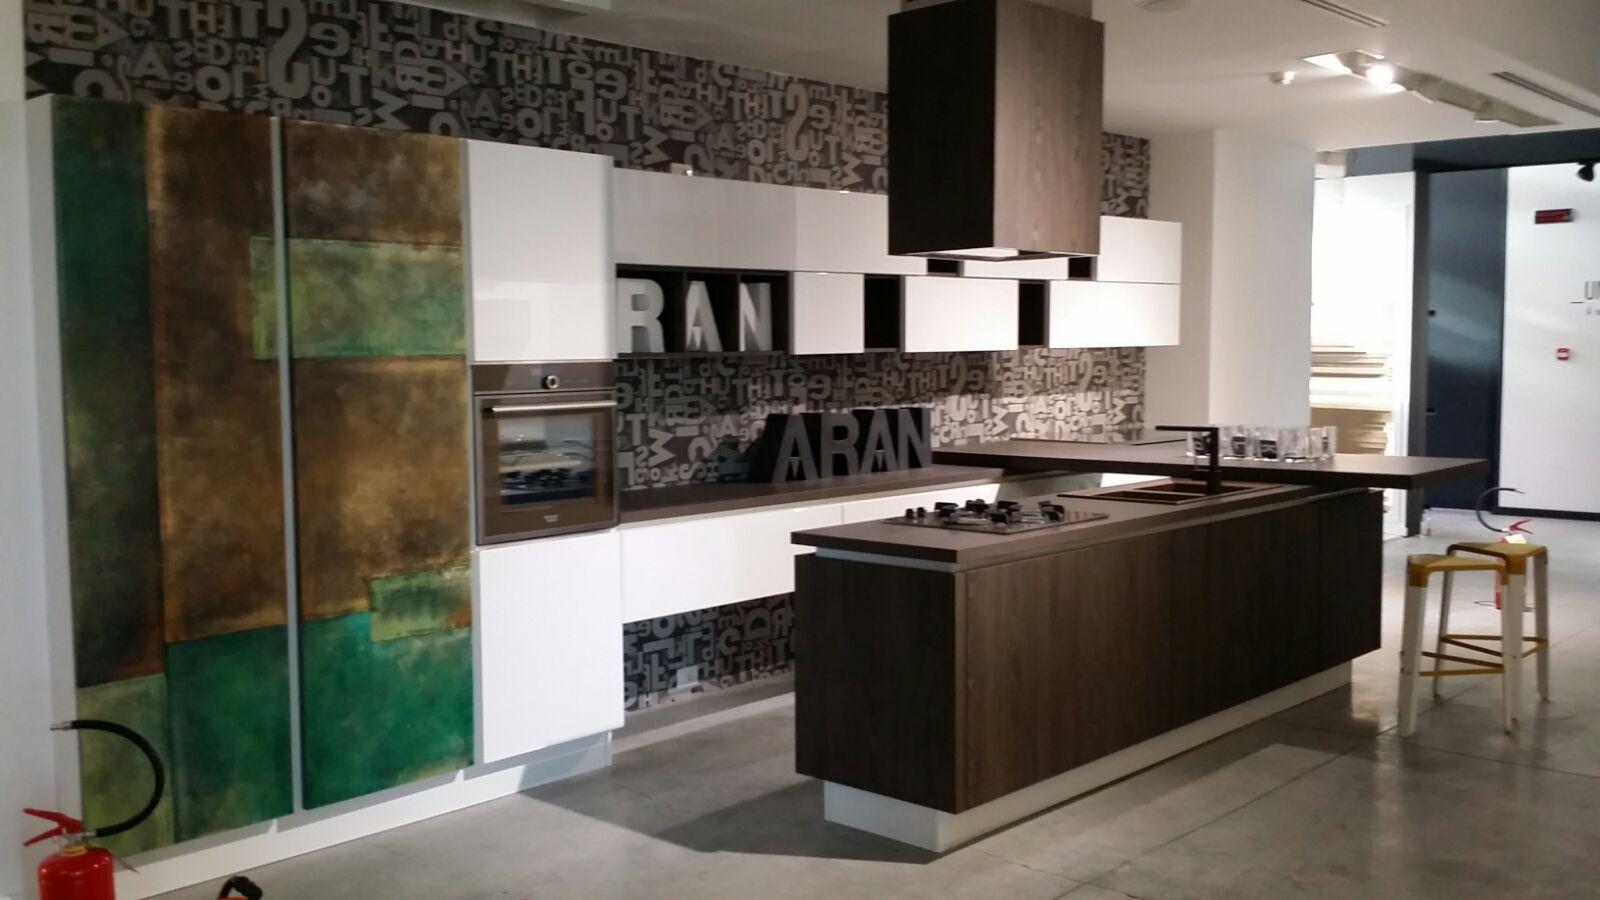 Cucine abruzzo great elegante cucine rustiche in muratura - Rivenditori gatto cucine ...